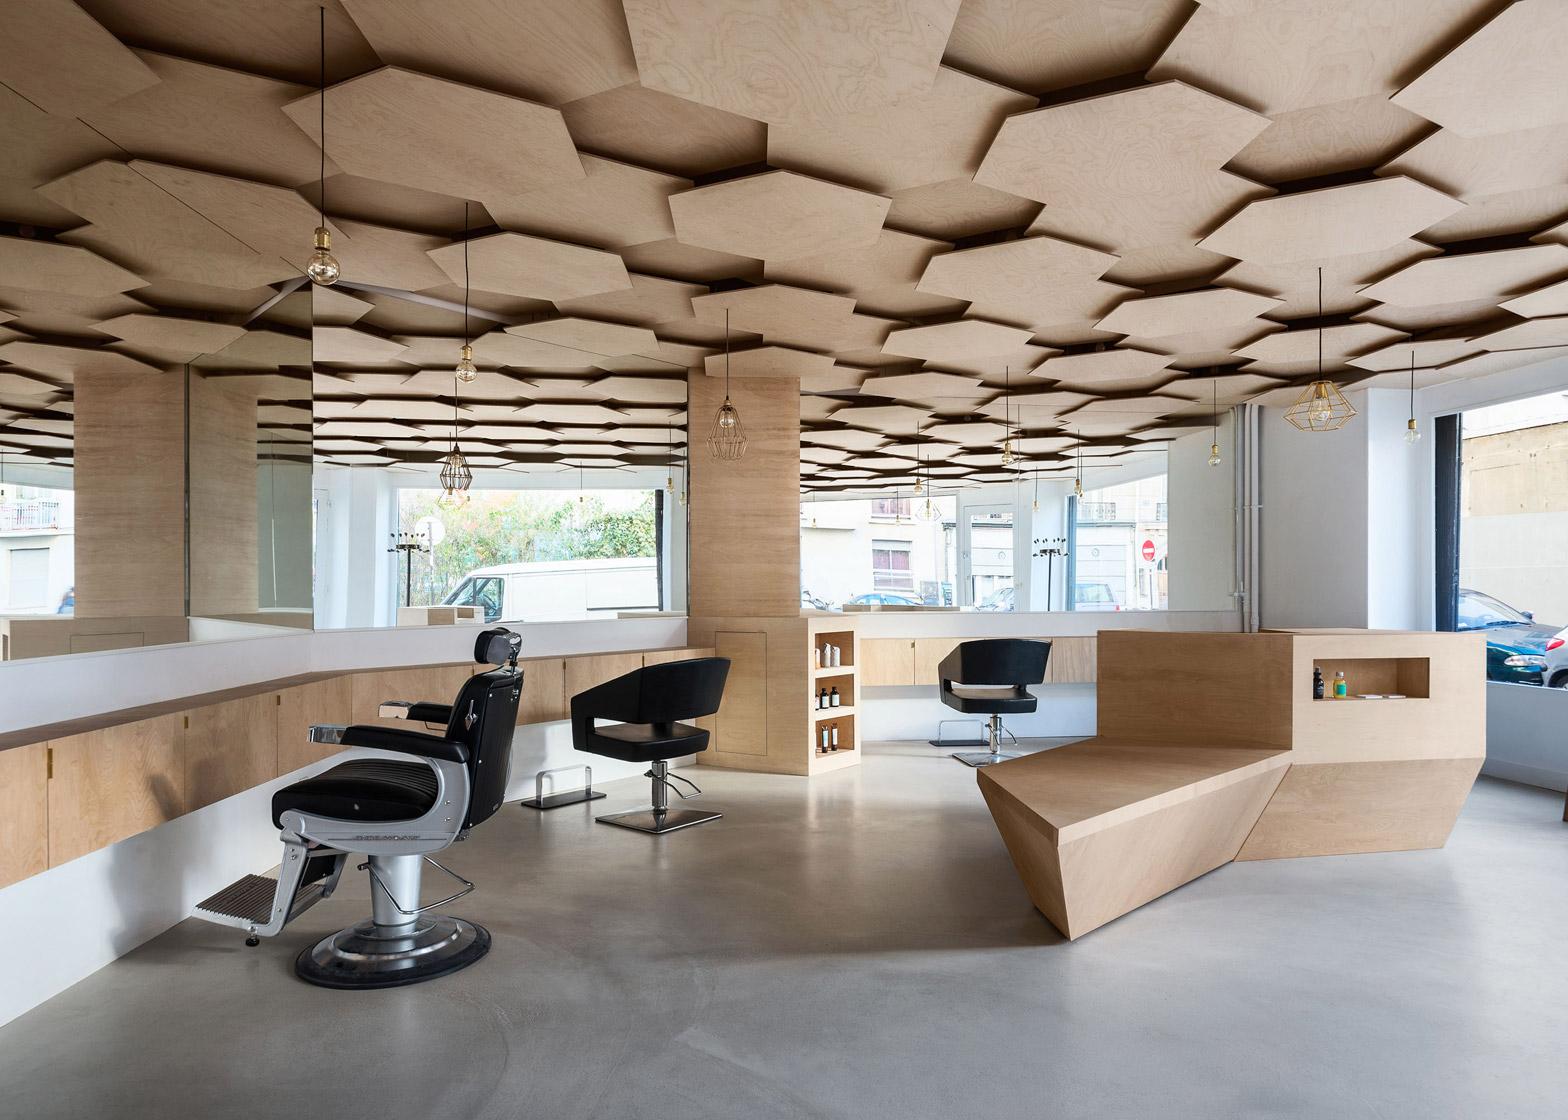 architecture_barber_shop_design_studia_interiors_osnovadesign_osnova_poltava_03